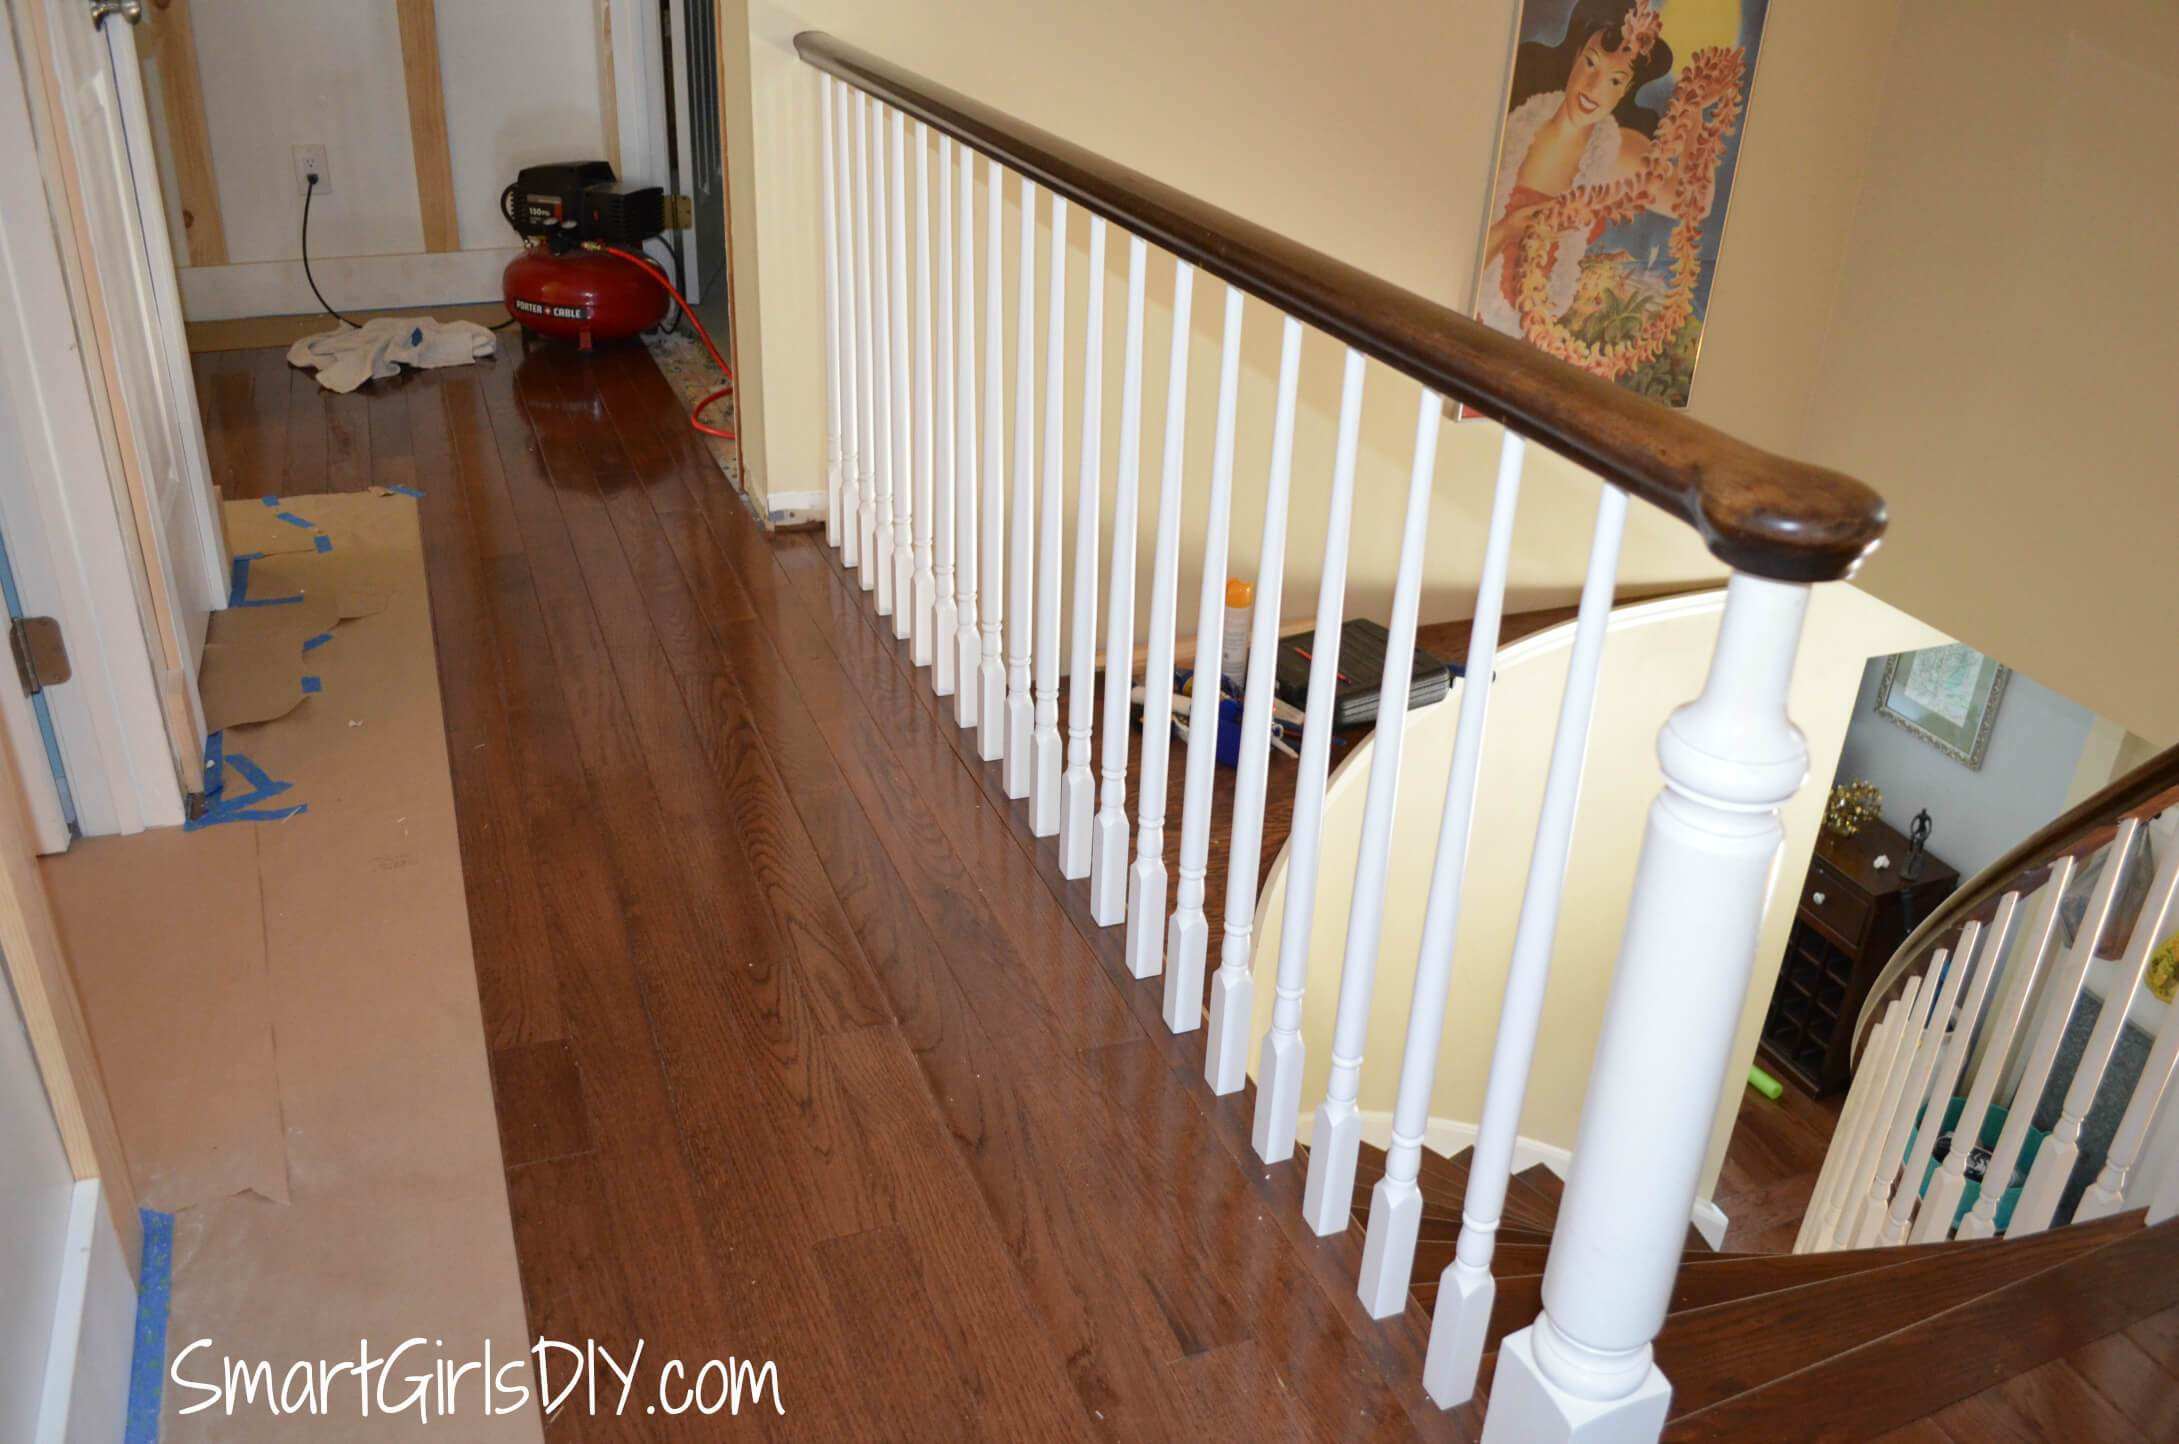 can you install hardwood floors yourself of upstairs hallway 1 installing hardwood floors in upstairs hallway 2 hardwood spindles